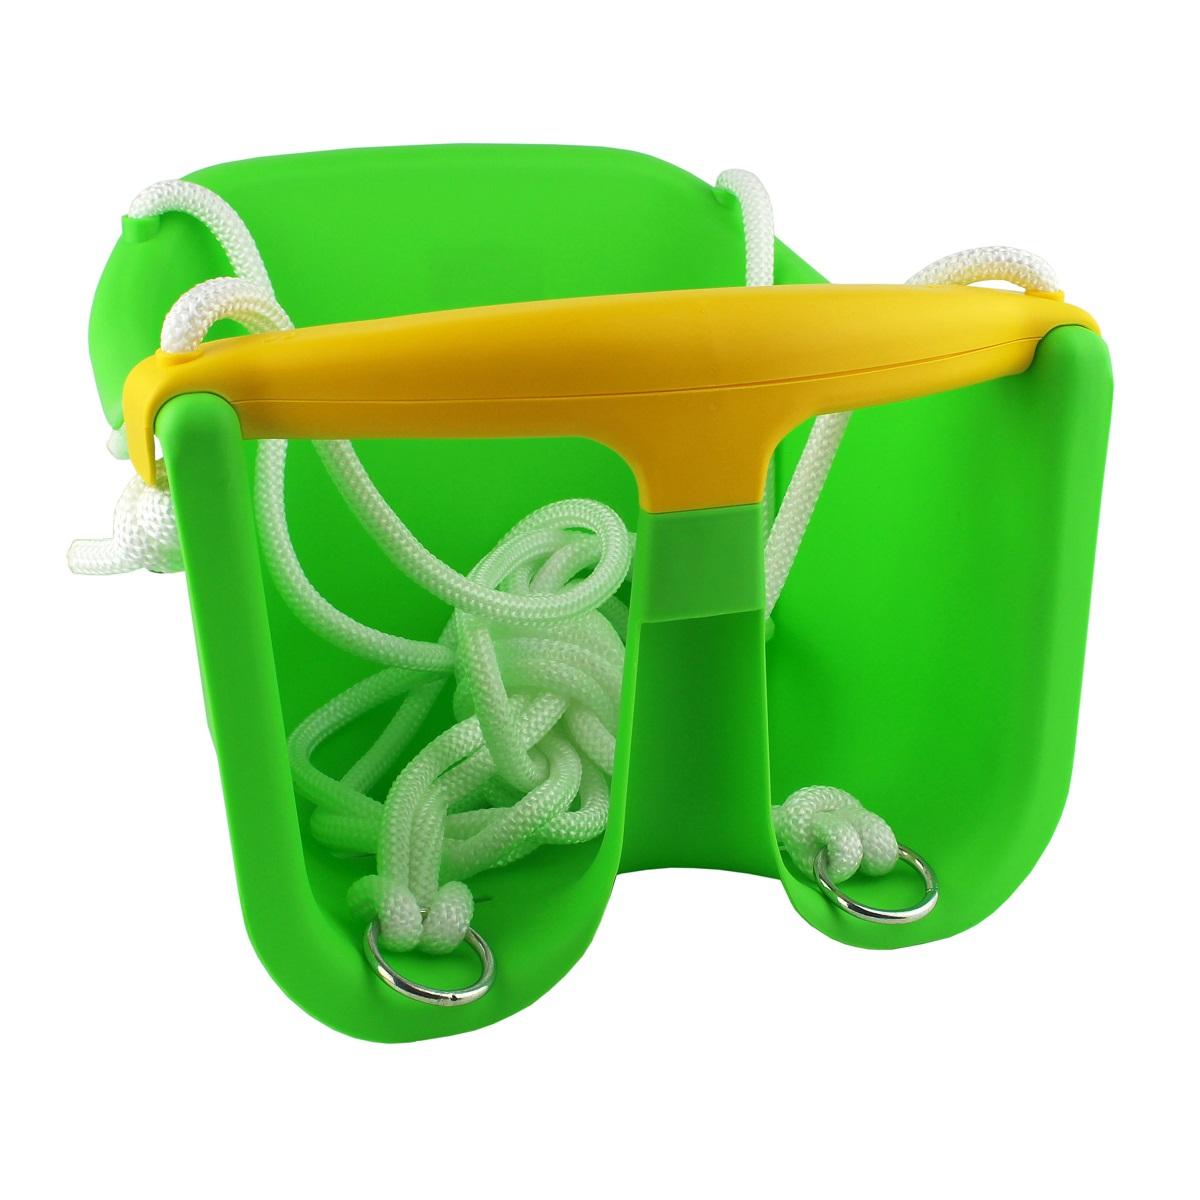 Detská hojdačka MASTER Baby plast - zelená